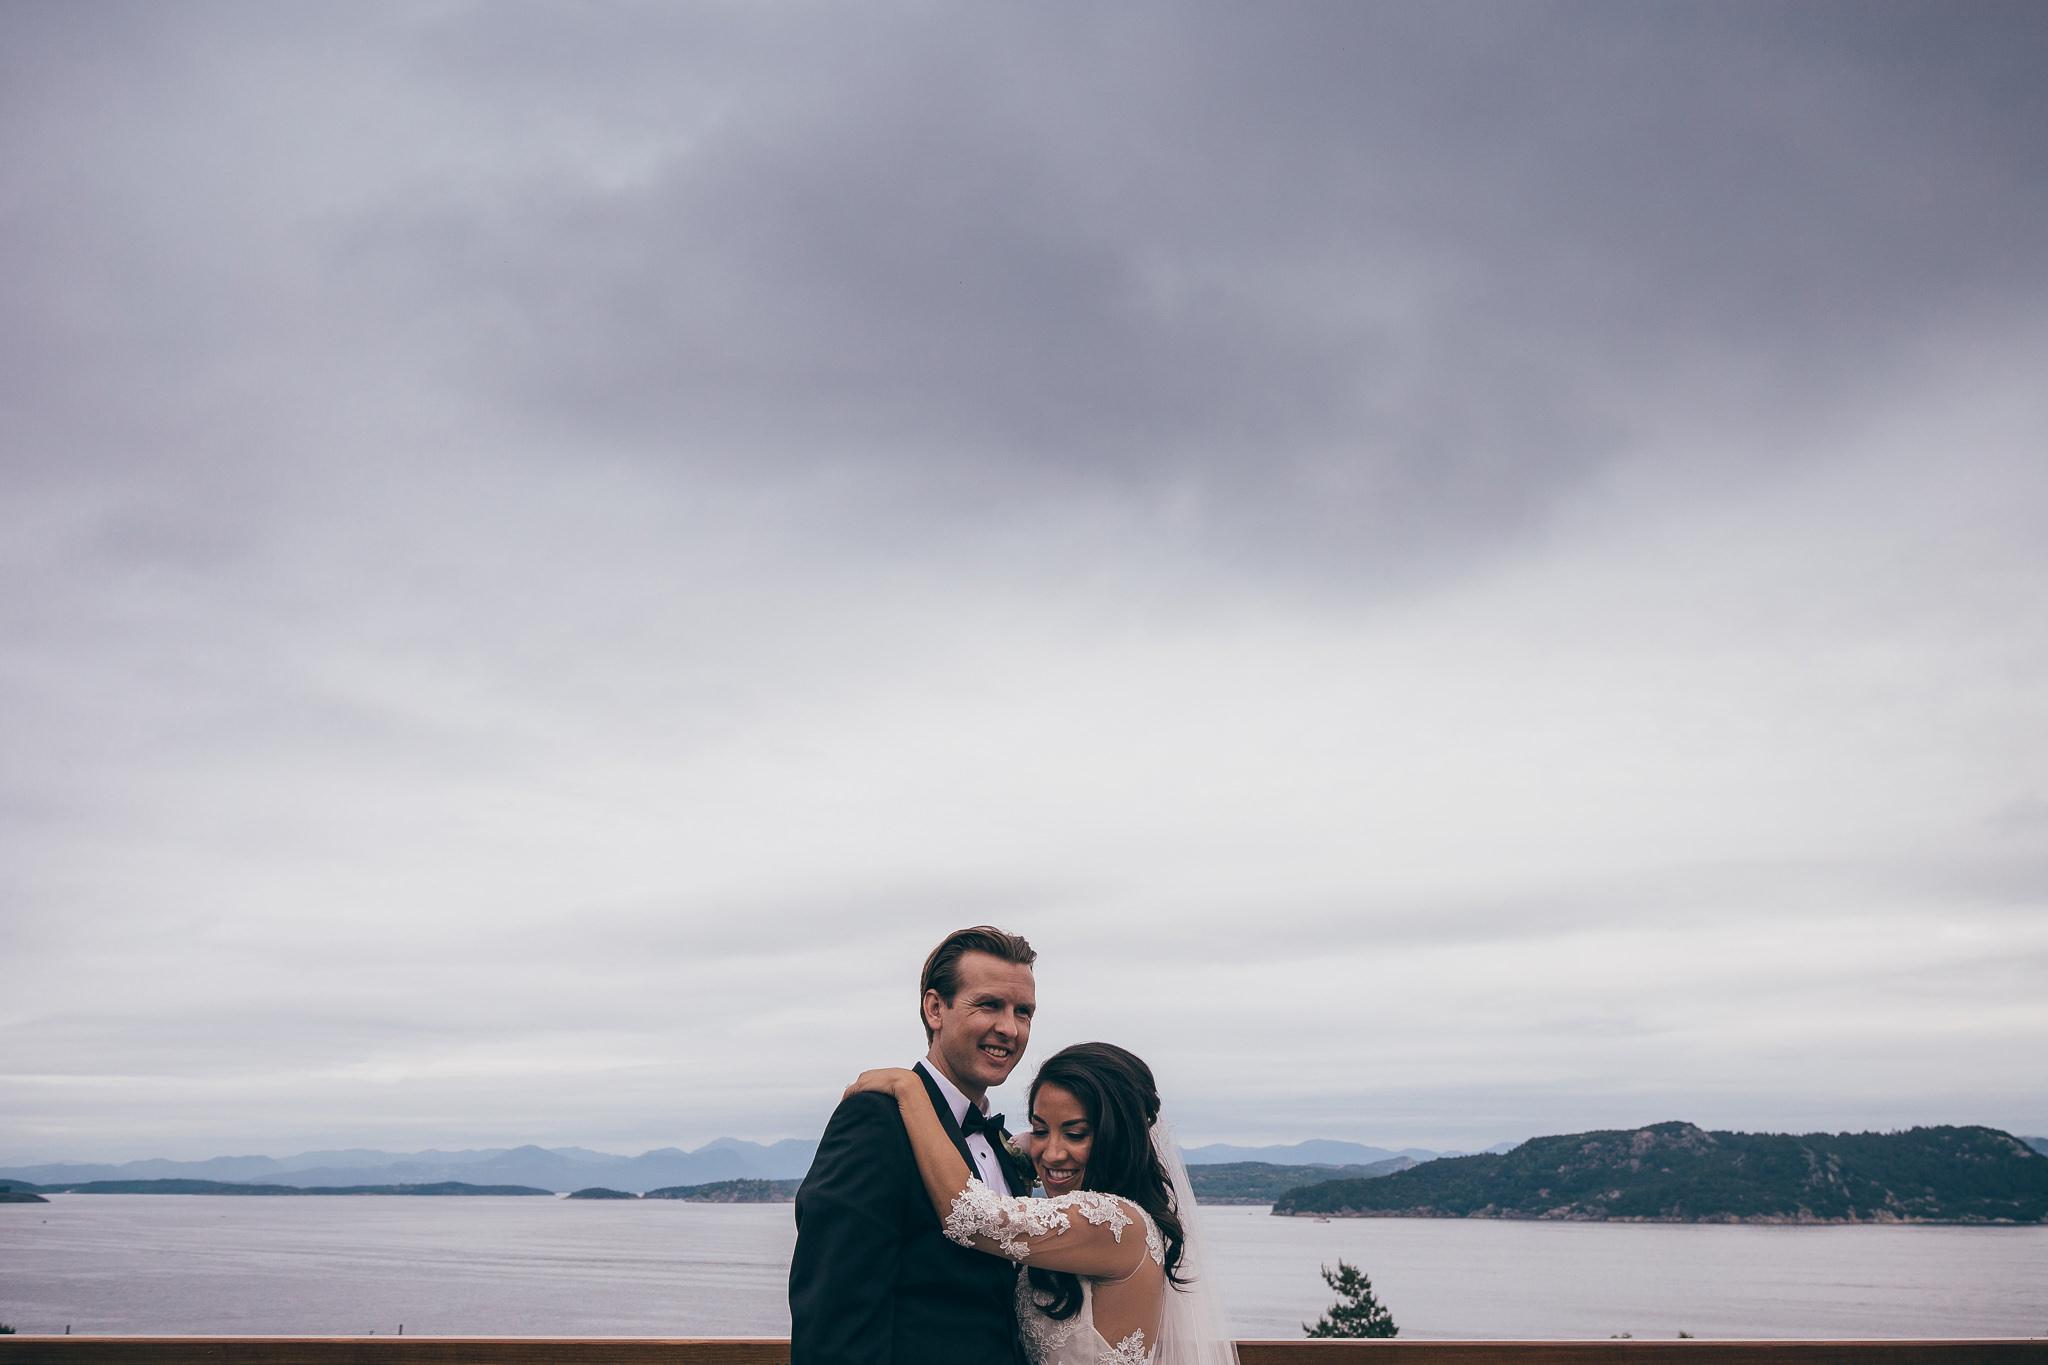 Wedding+Photographer+Norway+Bryllupsfotograf+Casey+Arneson+MK-159.jpg